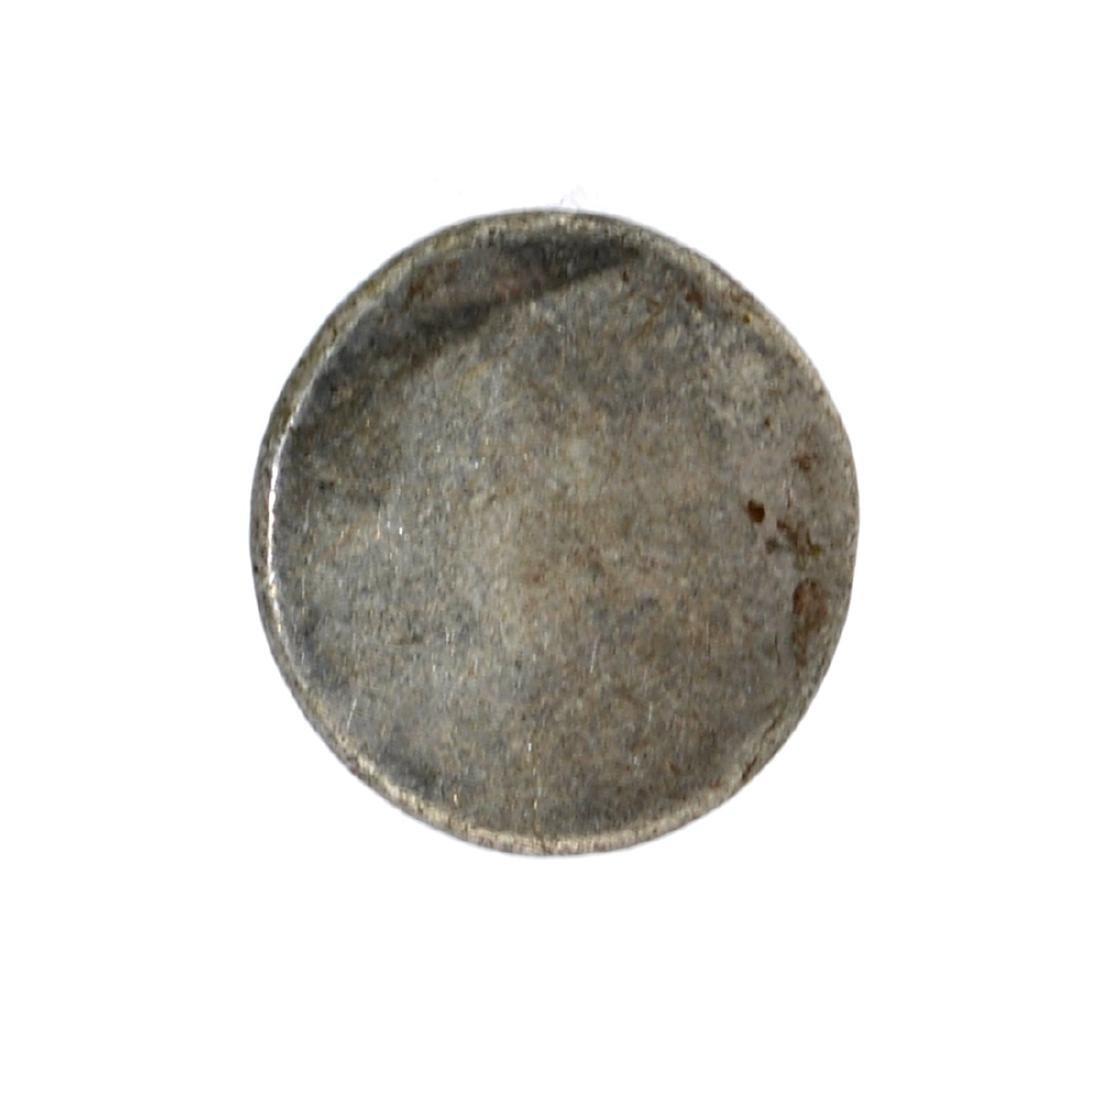 1847 Cambodia Billion 1/8 Tical Hamza Bird Facing Left, - 2